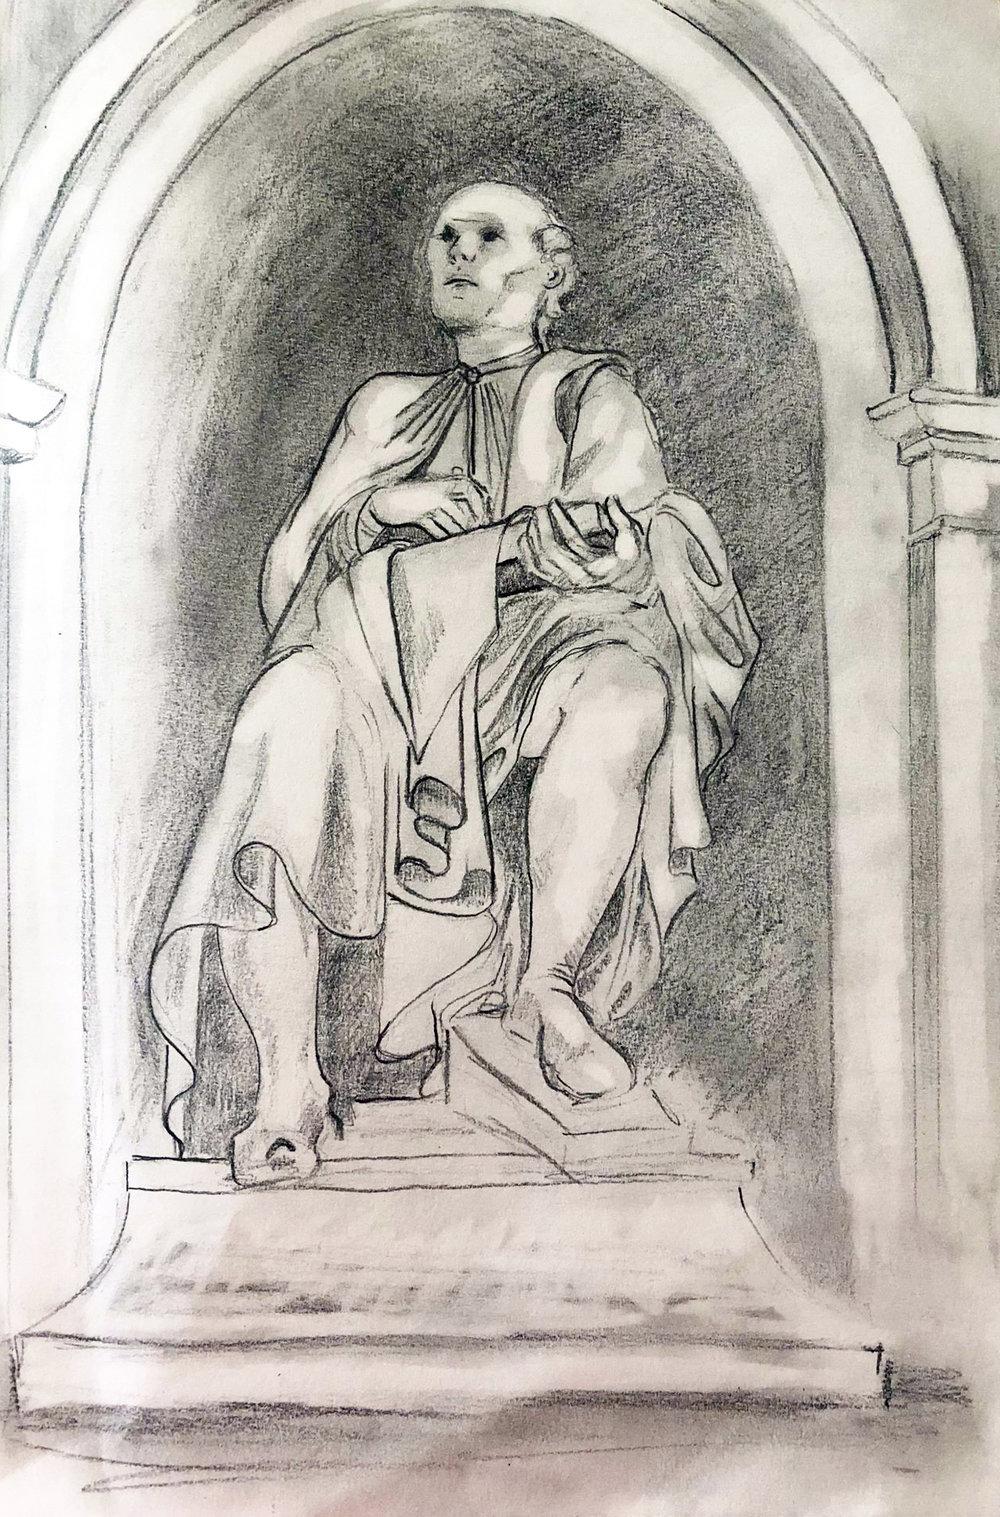 Duomo Sketch